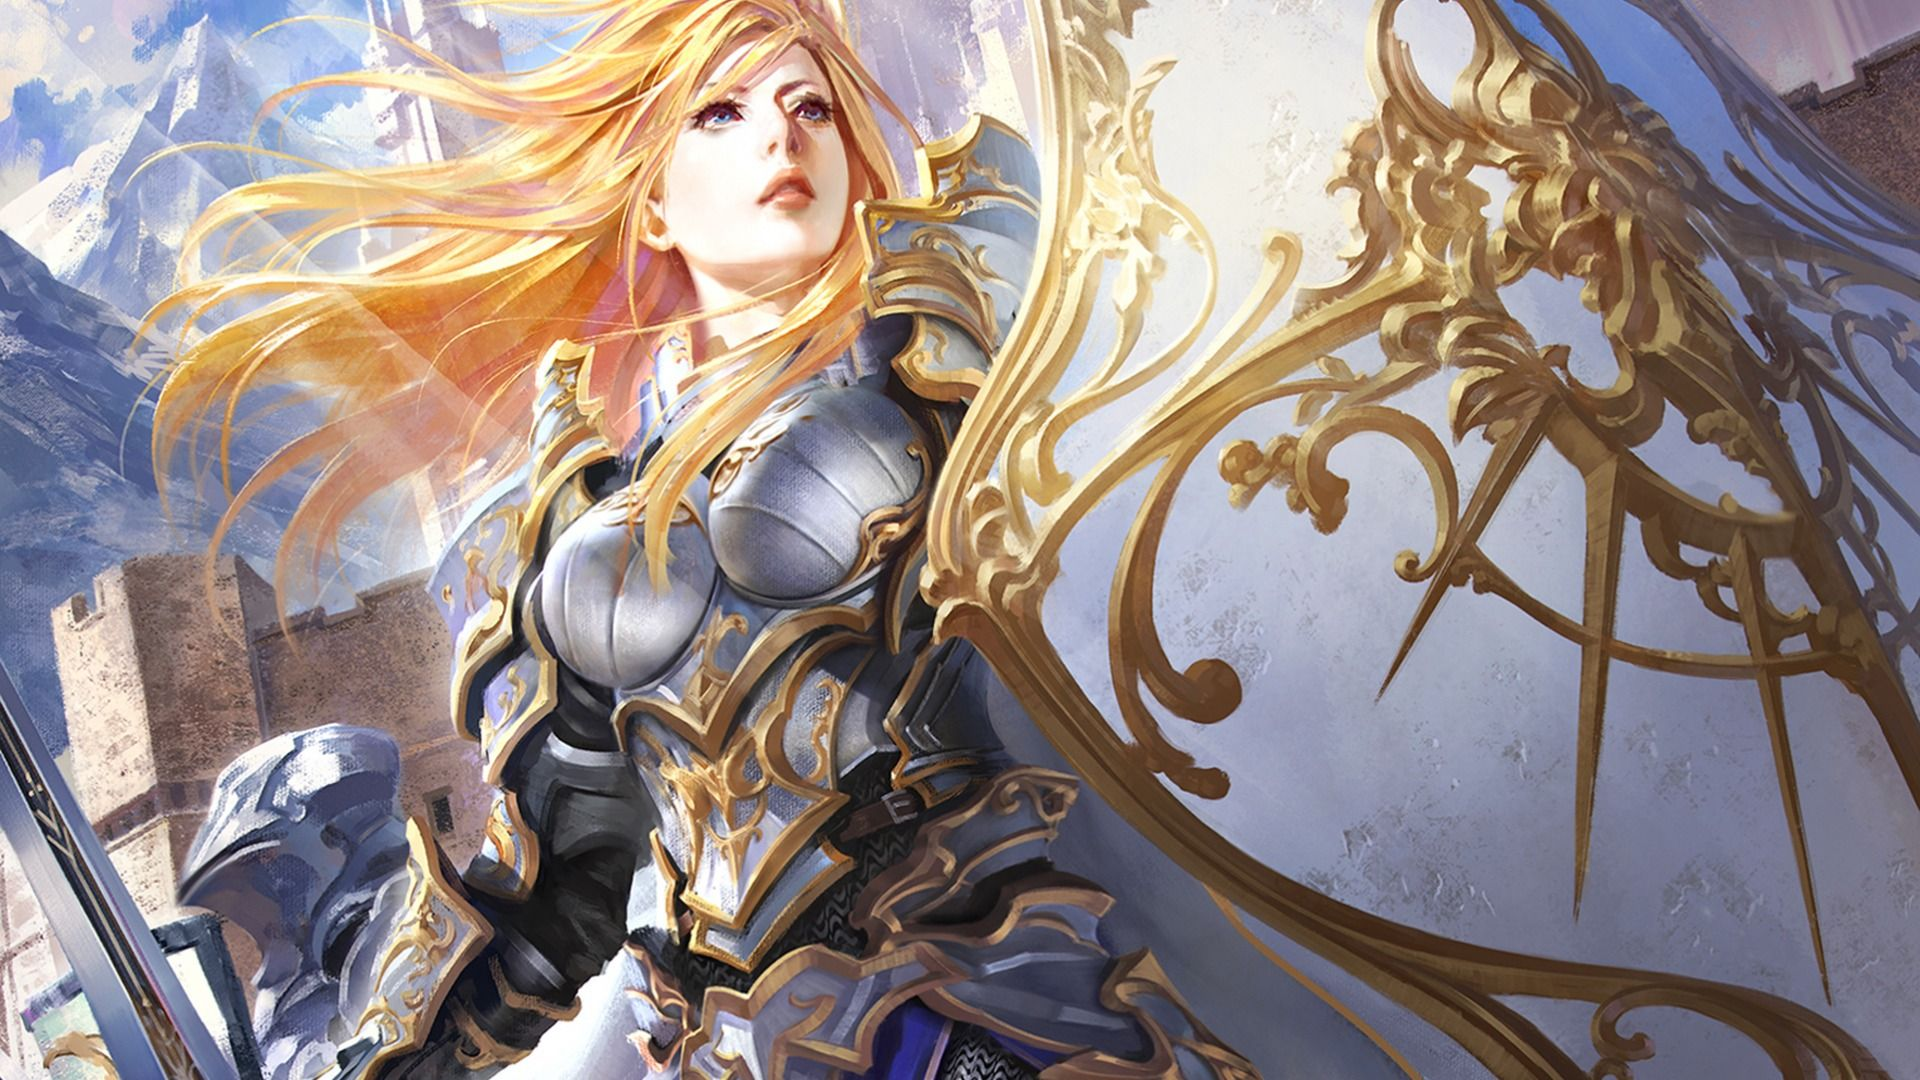 download wallpaper girl armor sword shield fantasy